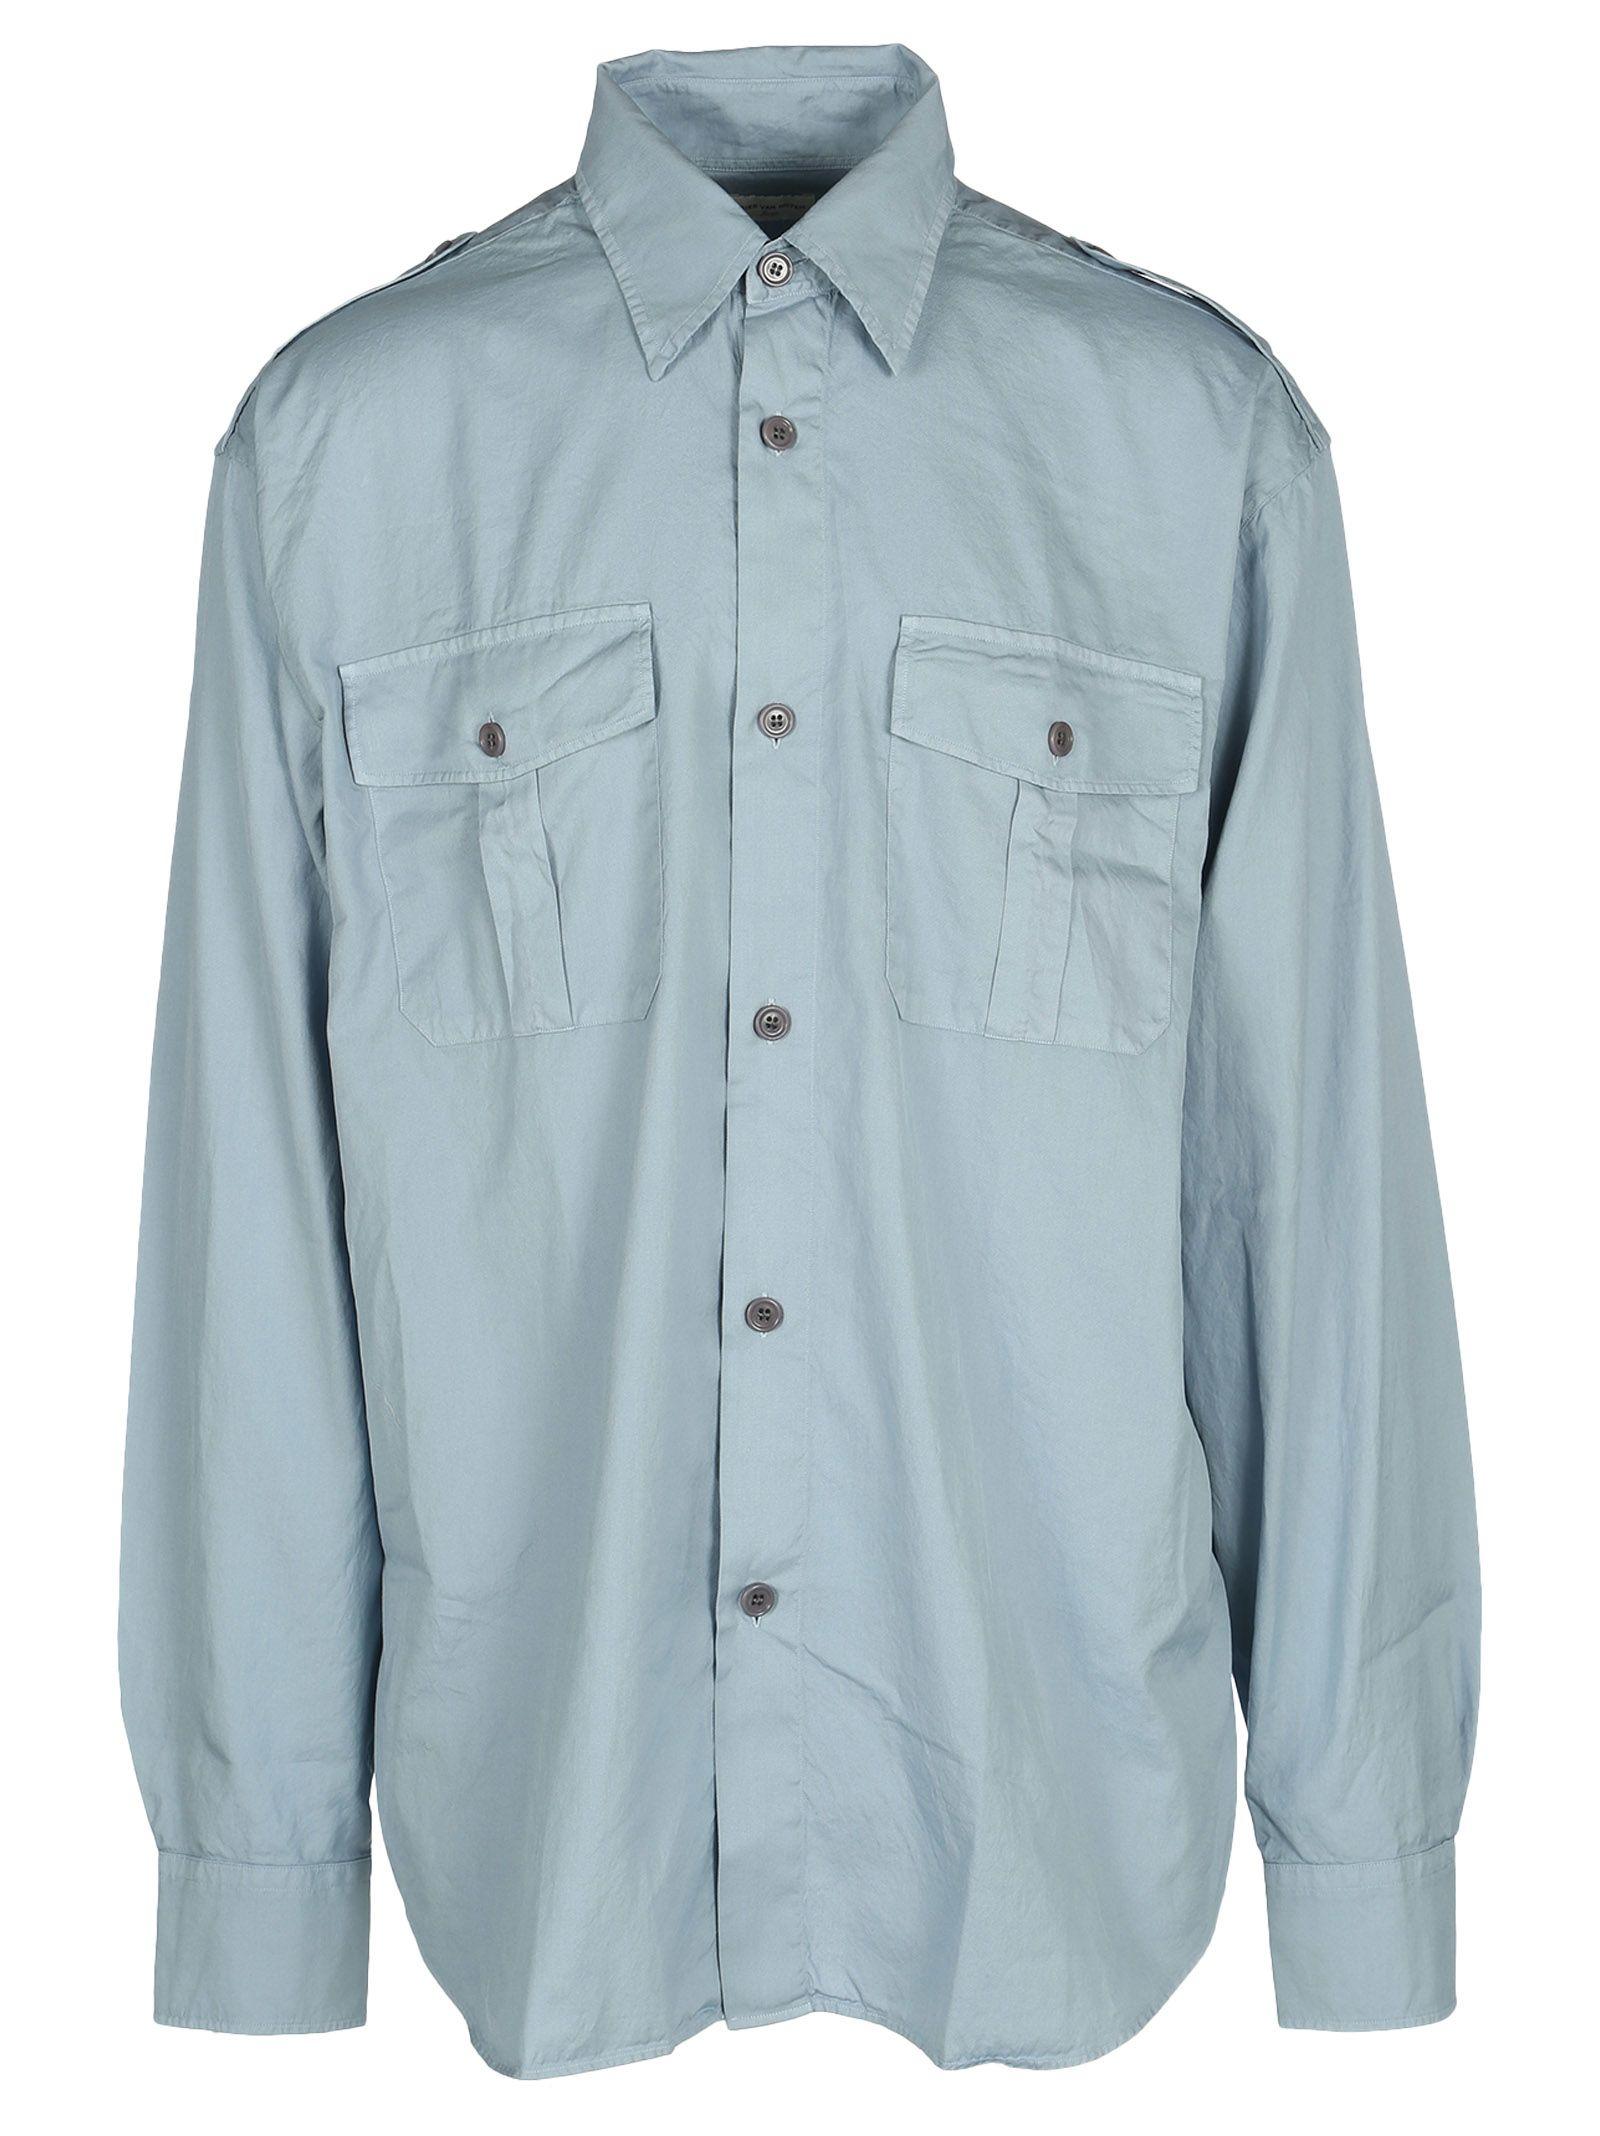 Dries Van Noten - Balloon Sleeve Shirt